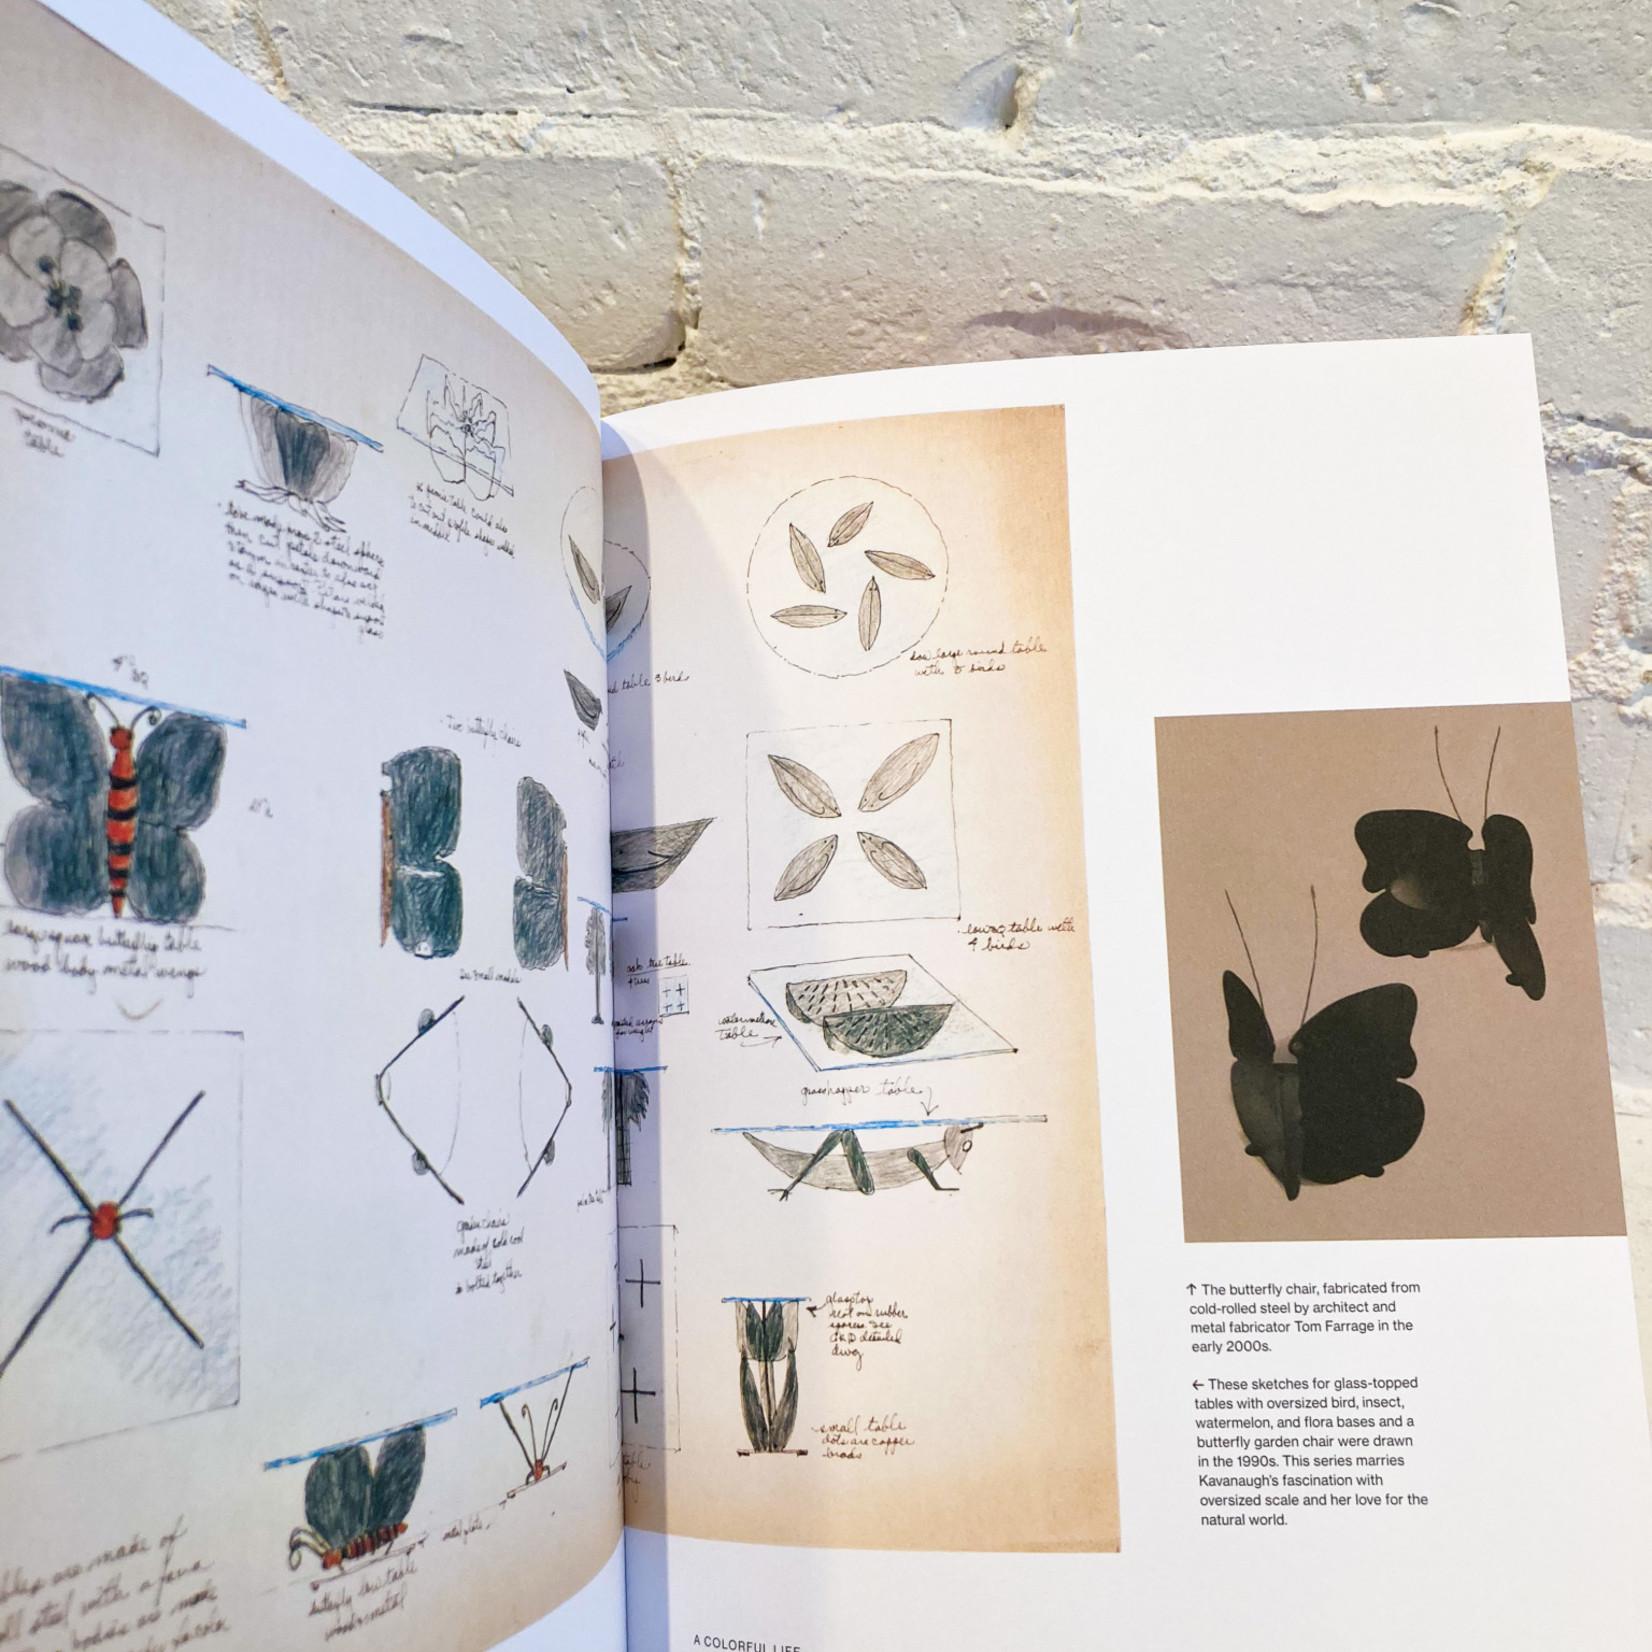 A Colorful Life: Gere Kavanaugh, Designer by Louise Sandhaus & Kat Catmur